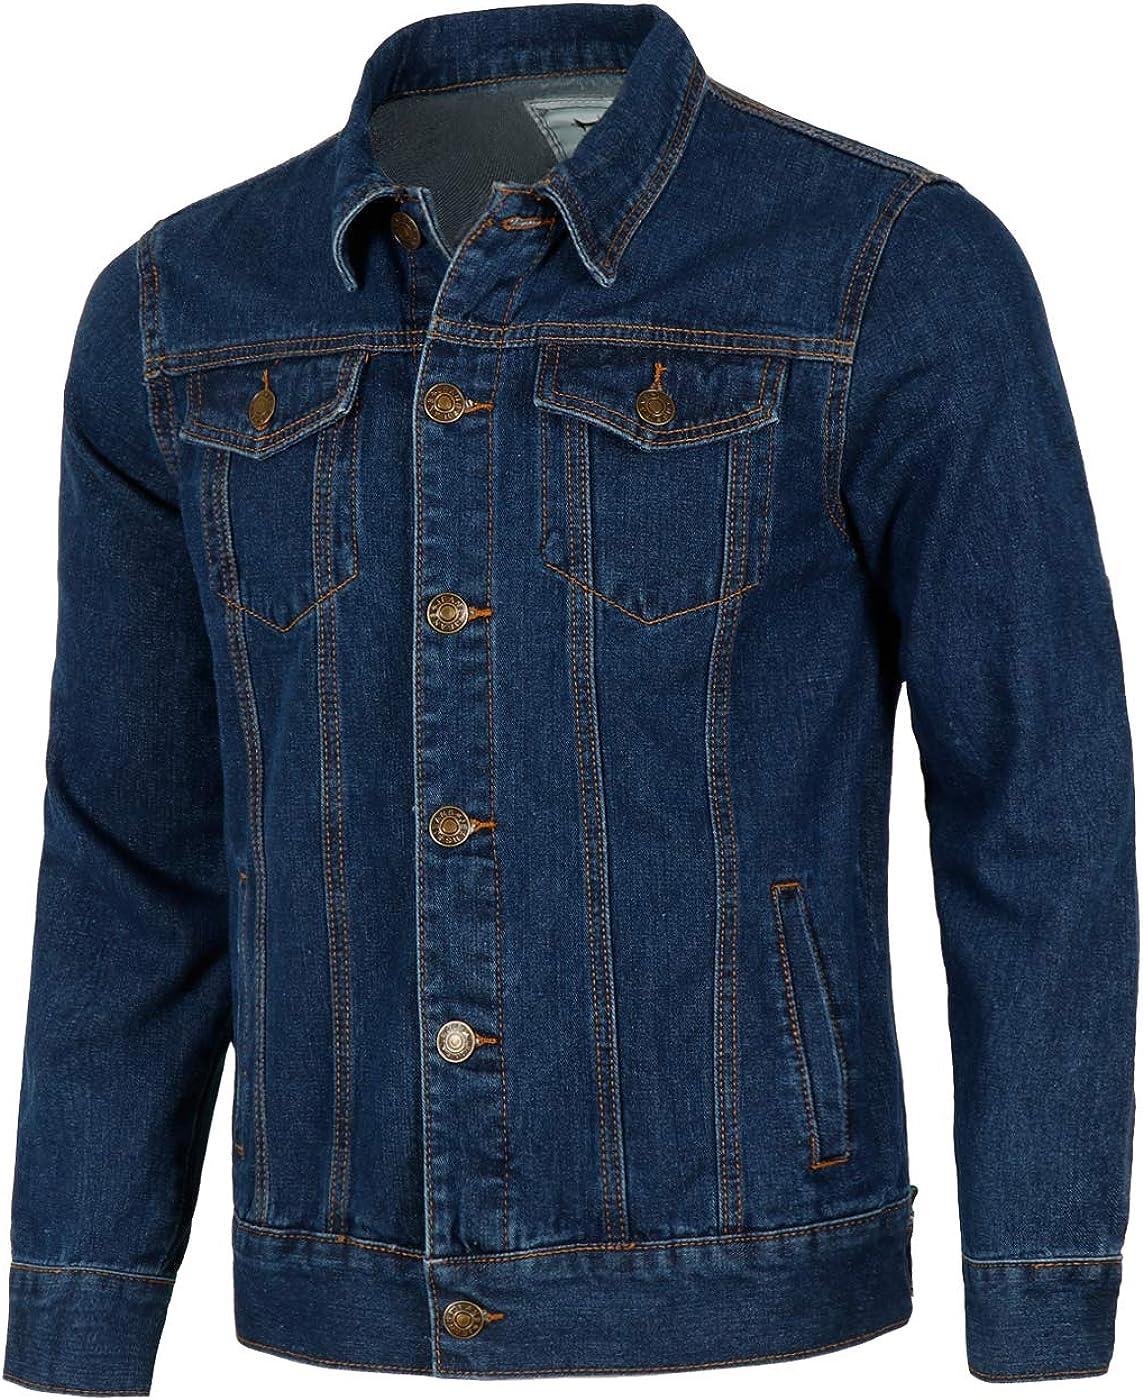 Yingqible Mens Denim Coat Autumn Winter Button Vintage Denim Jeans Trucker Jacket Classic Western Style Coat Top